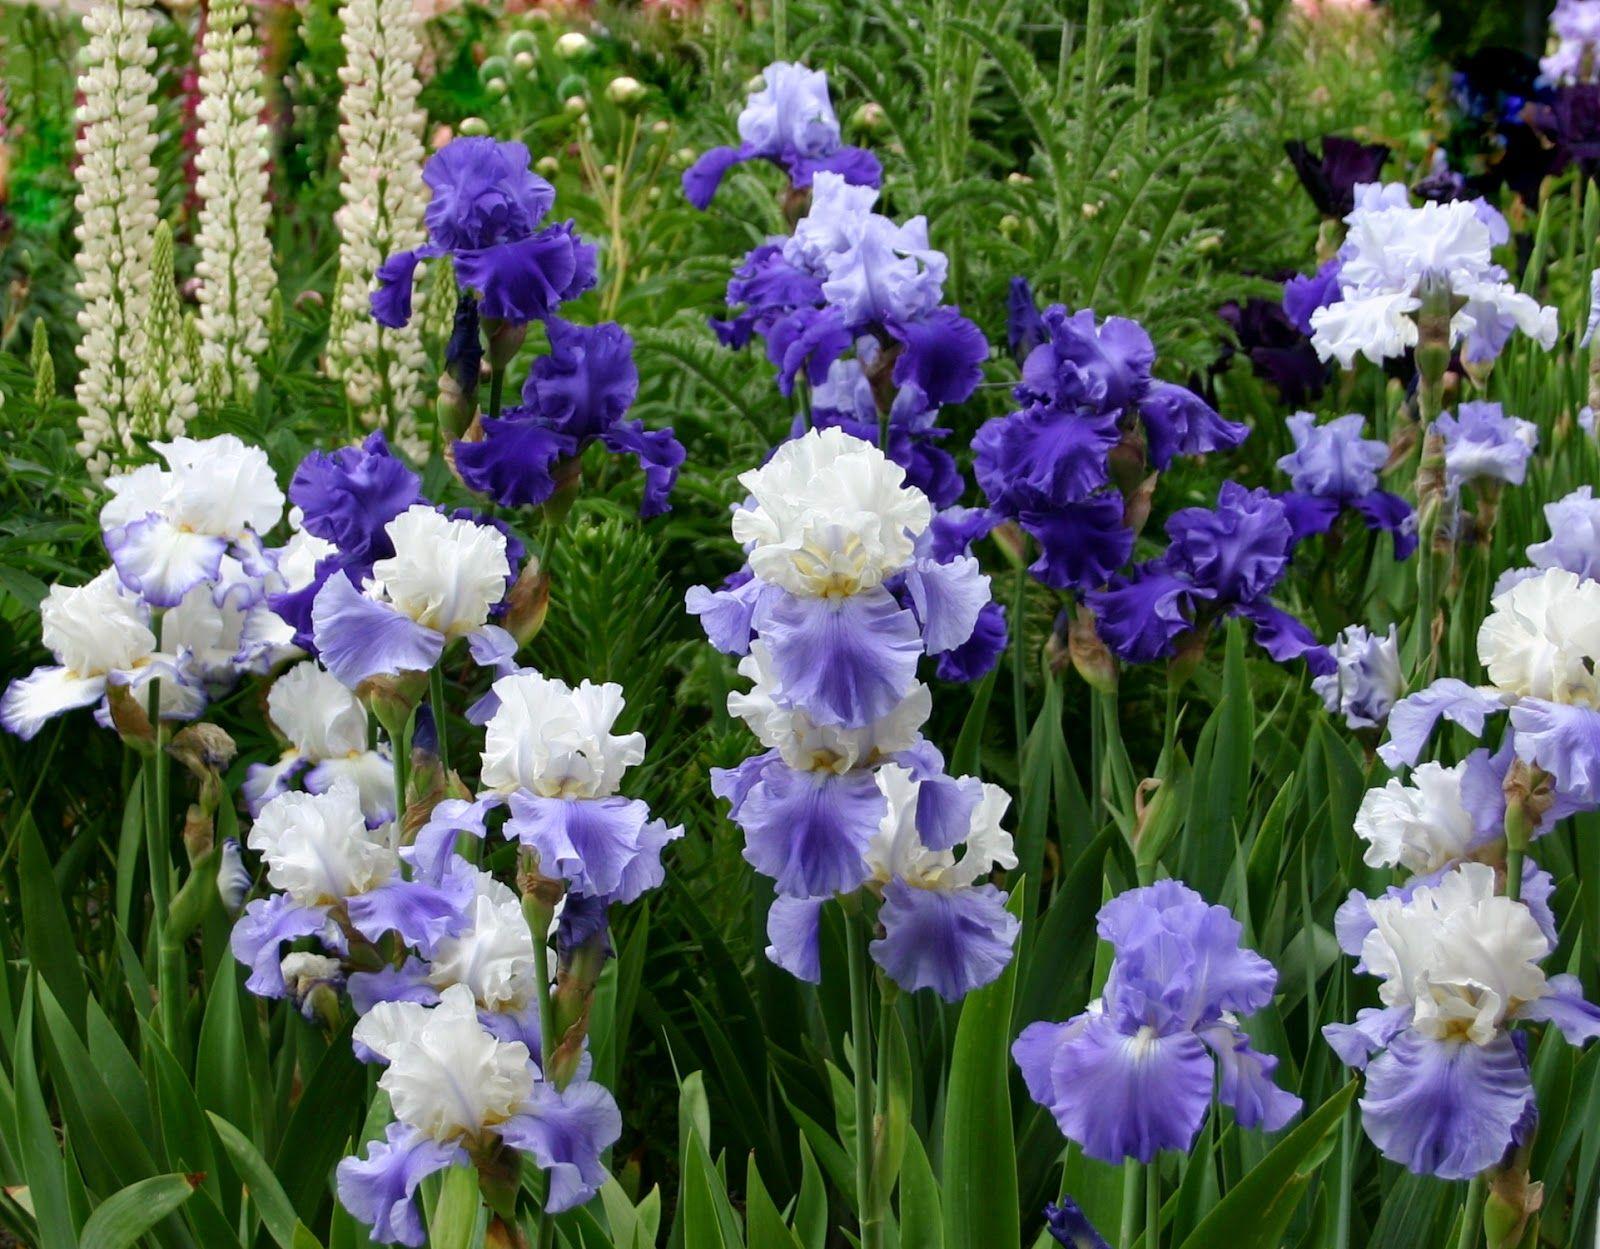 World Of Irises The Blue Iris Garden Planting A Monochromatic Tall Bearded Iris Bed Iris Flowers Iris Garden Flower Garden Plans